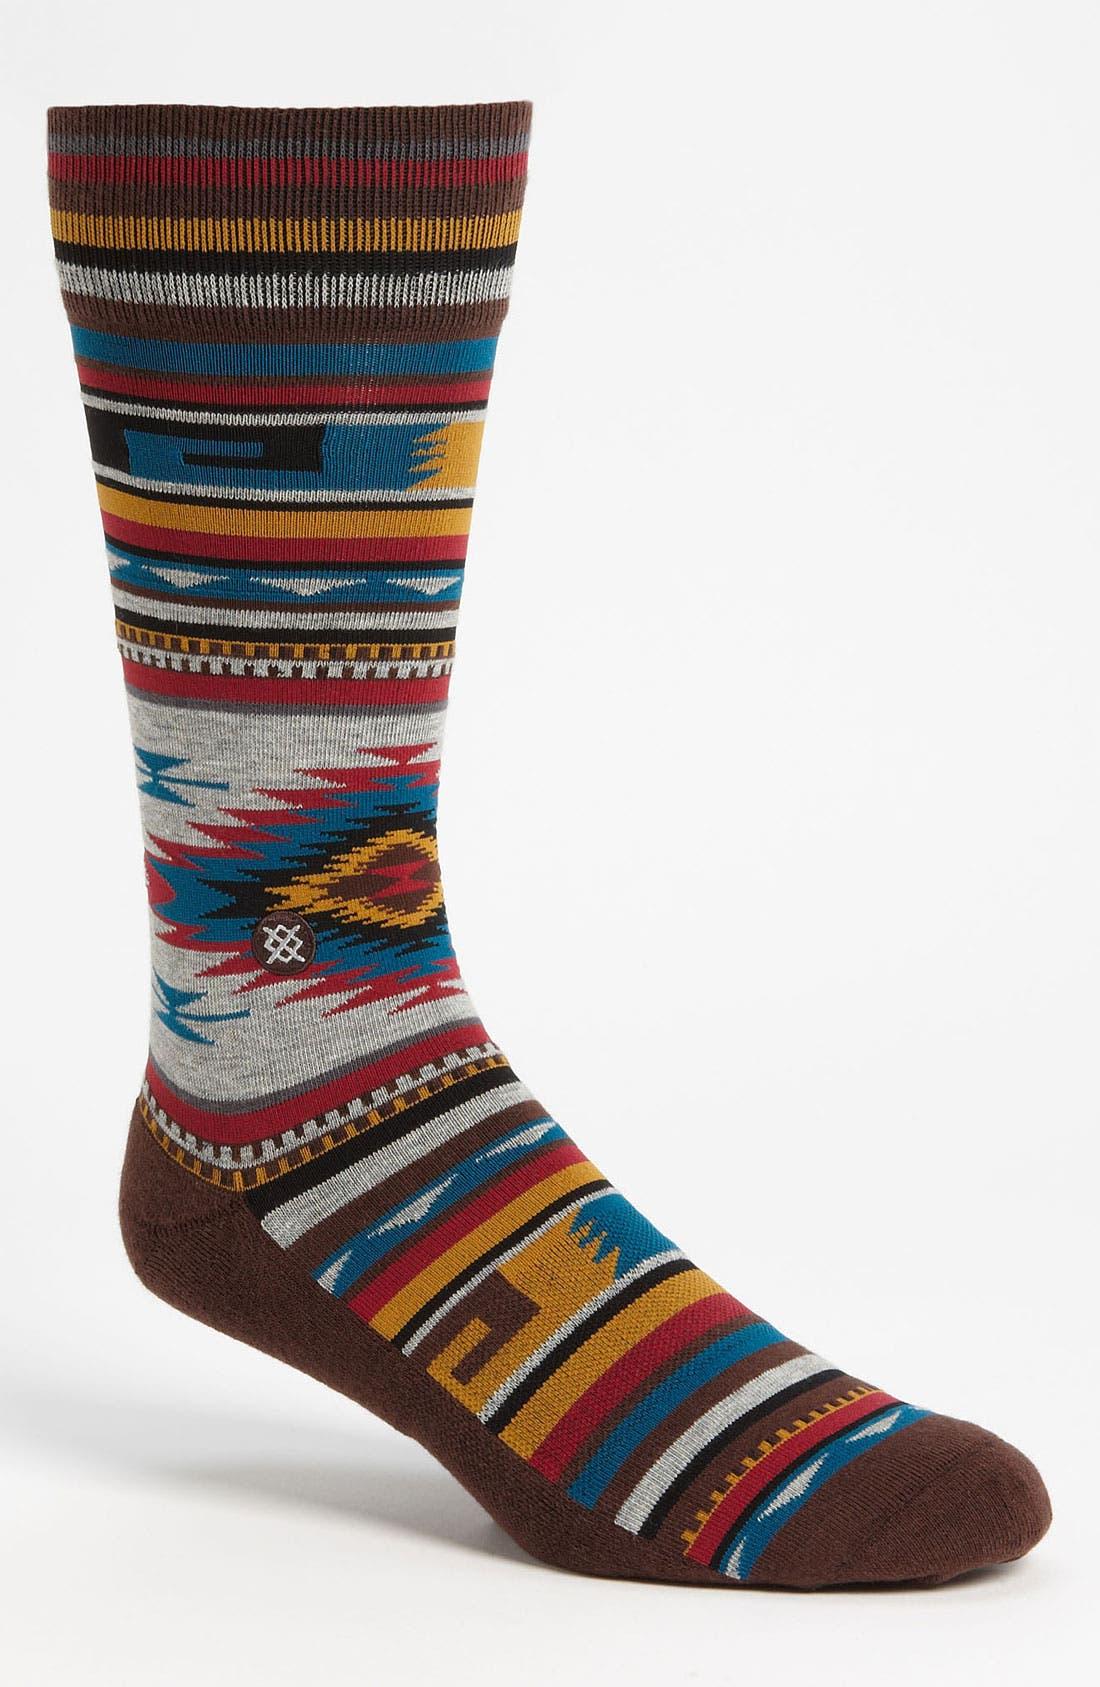 Alternate Image 1 Selected - Stance 'Outpost' Socks